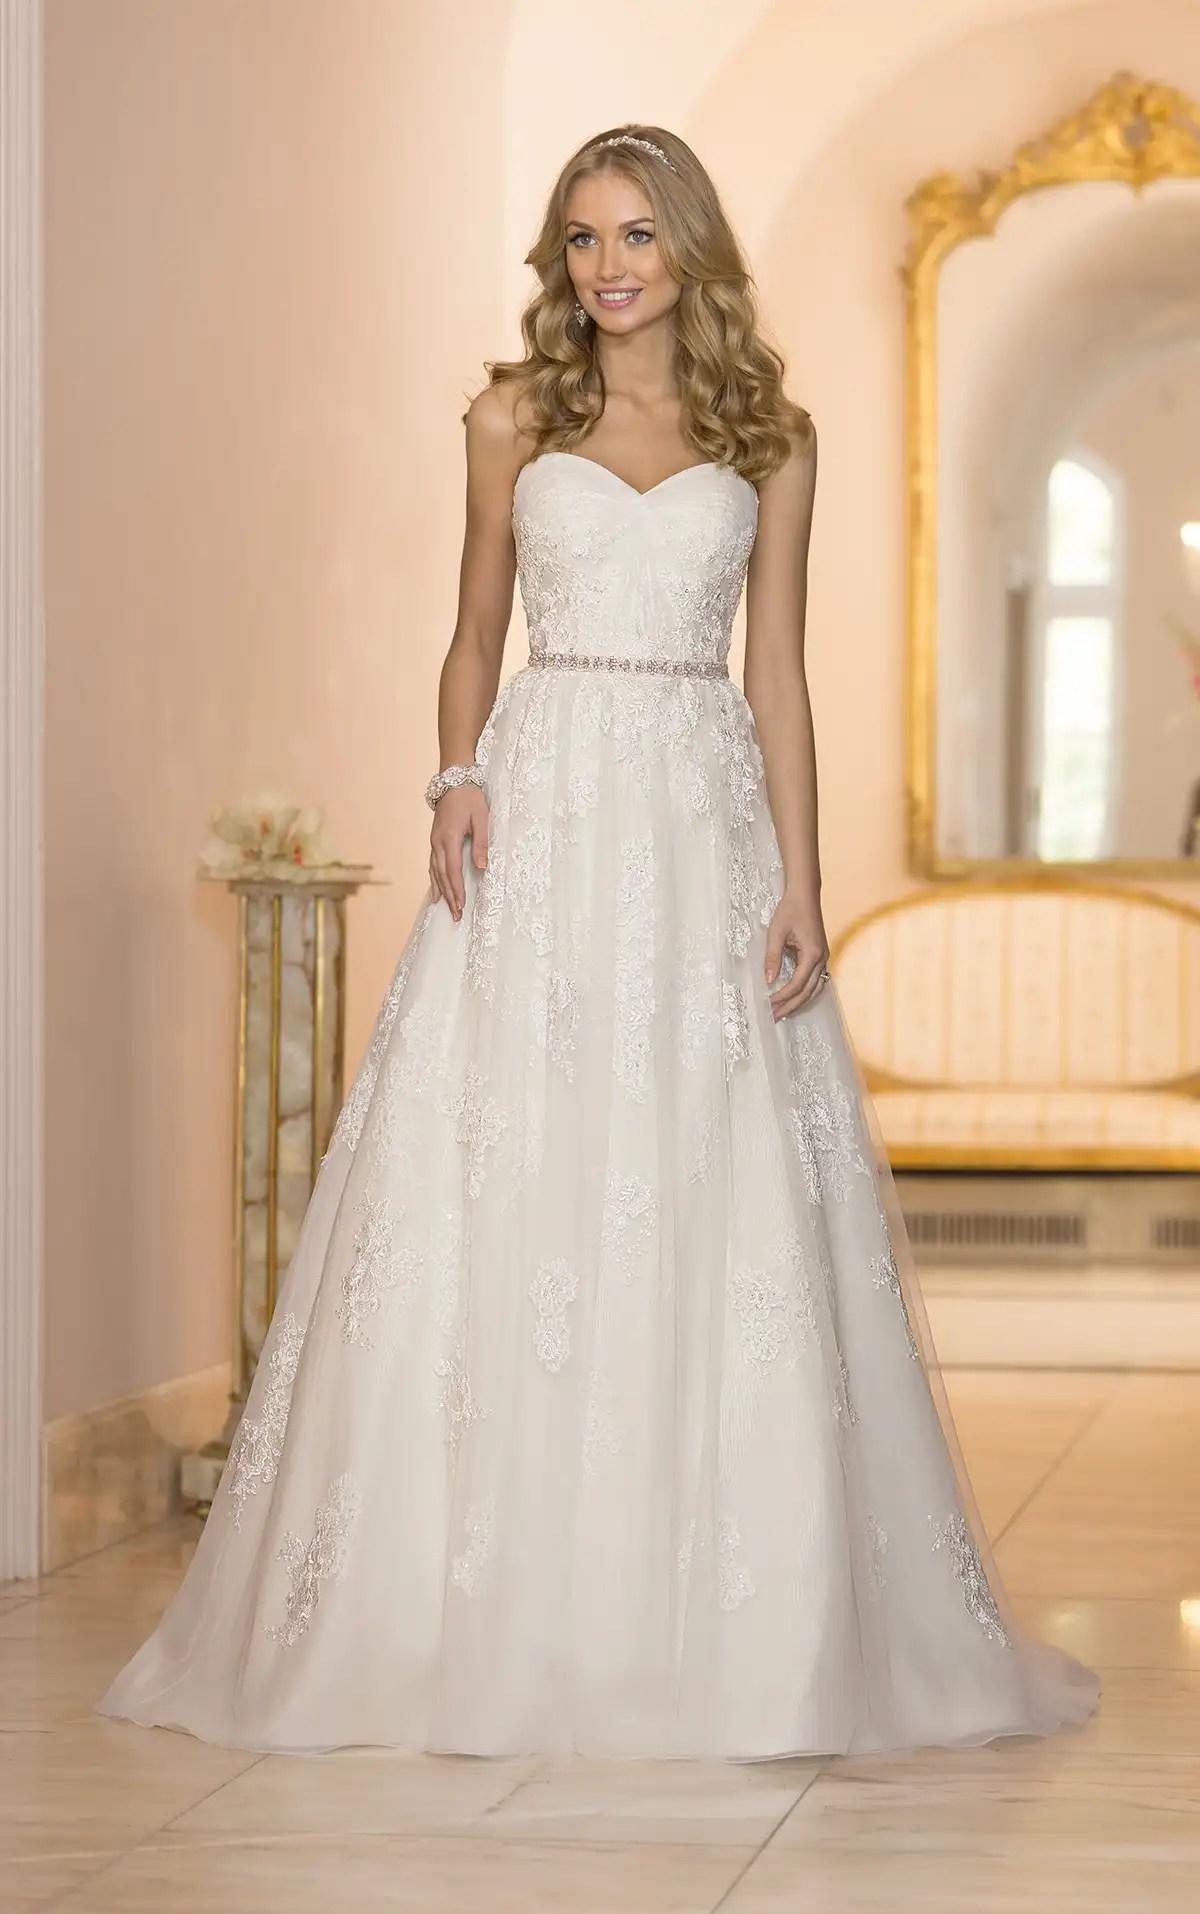 Flowing Tulle ALine Wedding Dress  Stella York Wedding